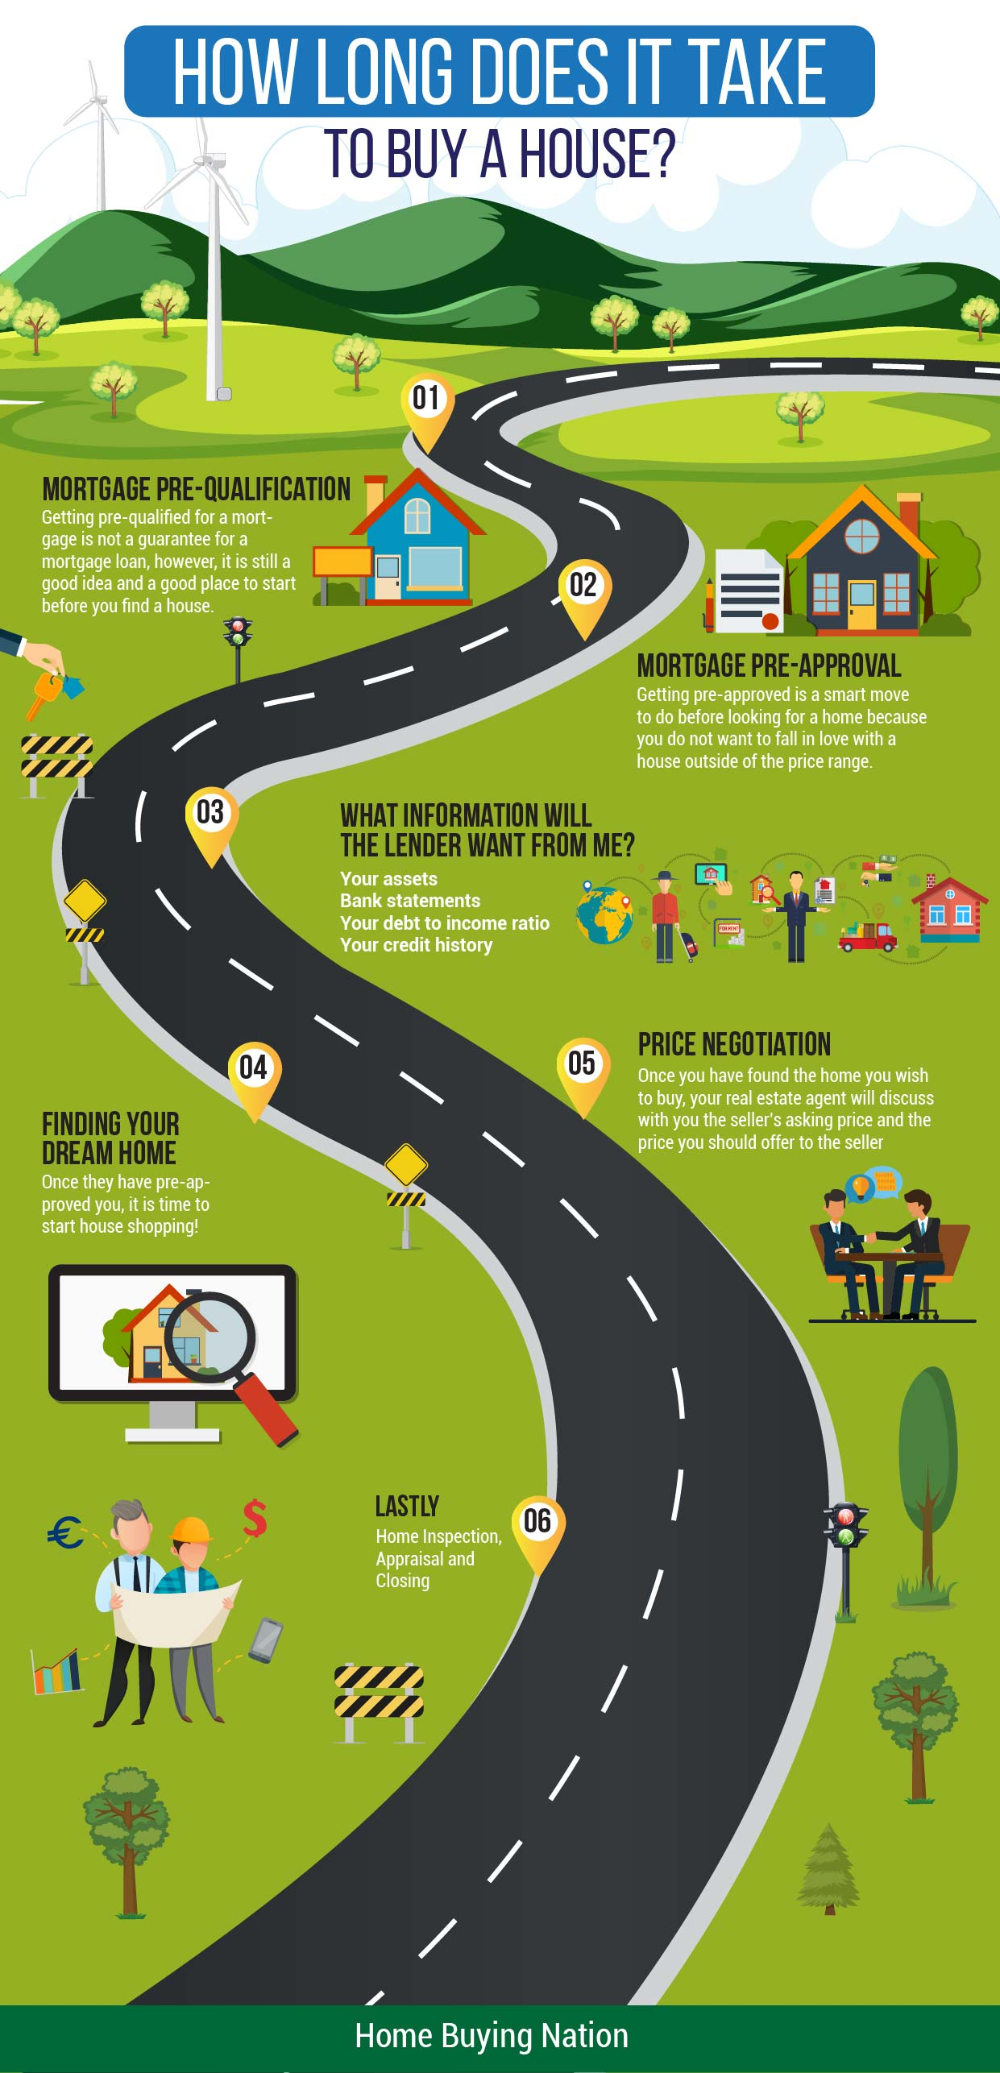 Mortgage Humor Tips Mortgagebrokermarketing Mortgagemarketingflyers Mortgage Saving In 2020 Real Estate Infographic Home Buying Mortgage Loans